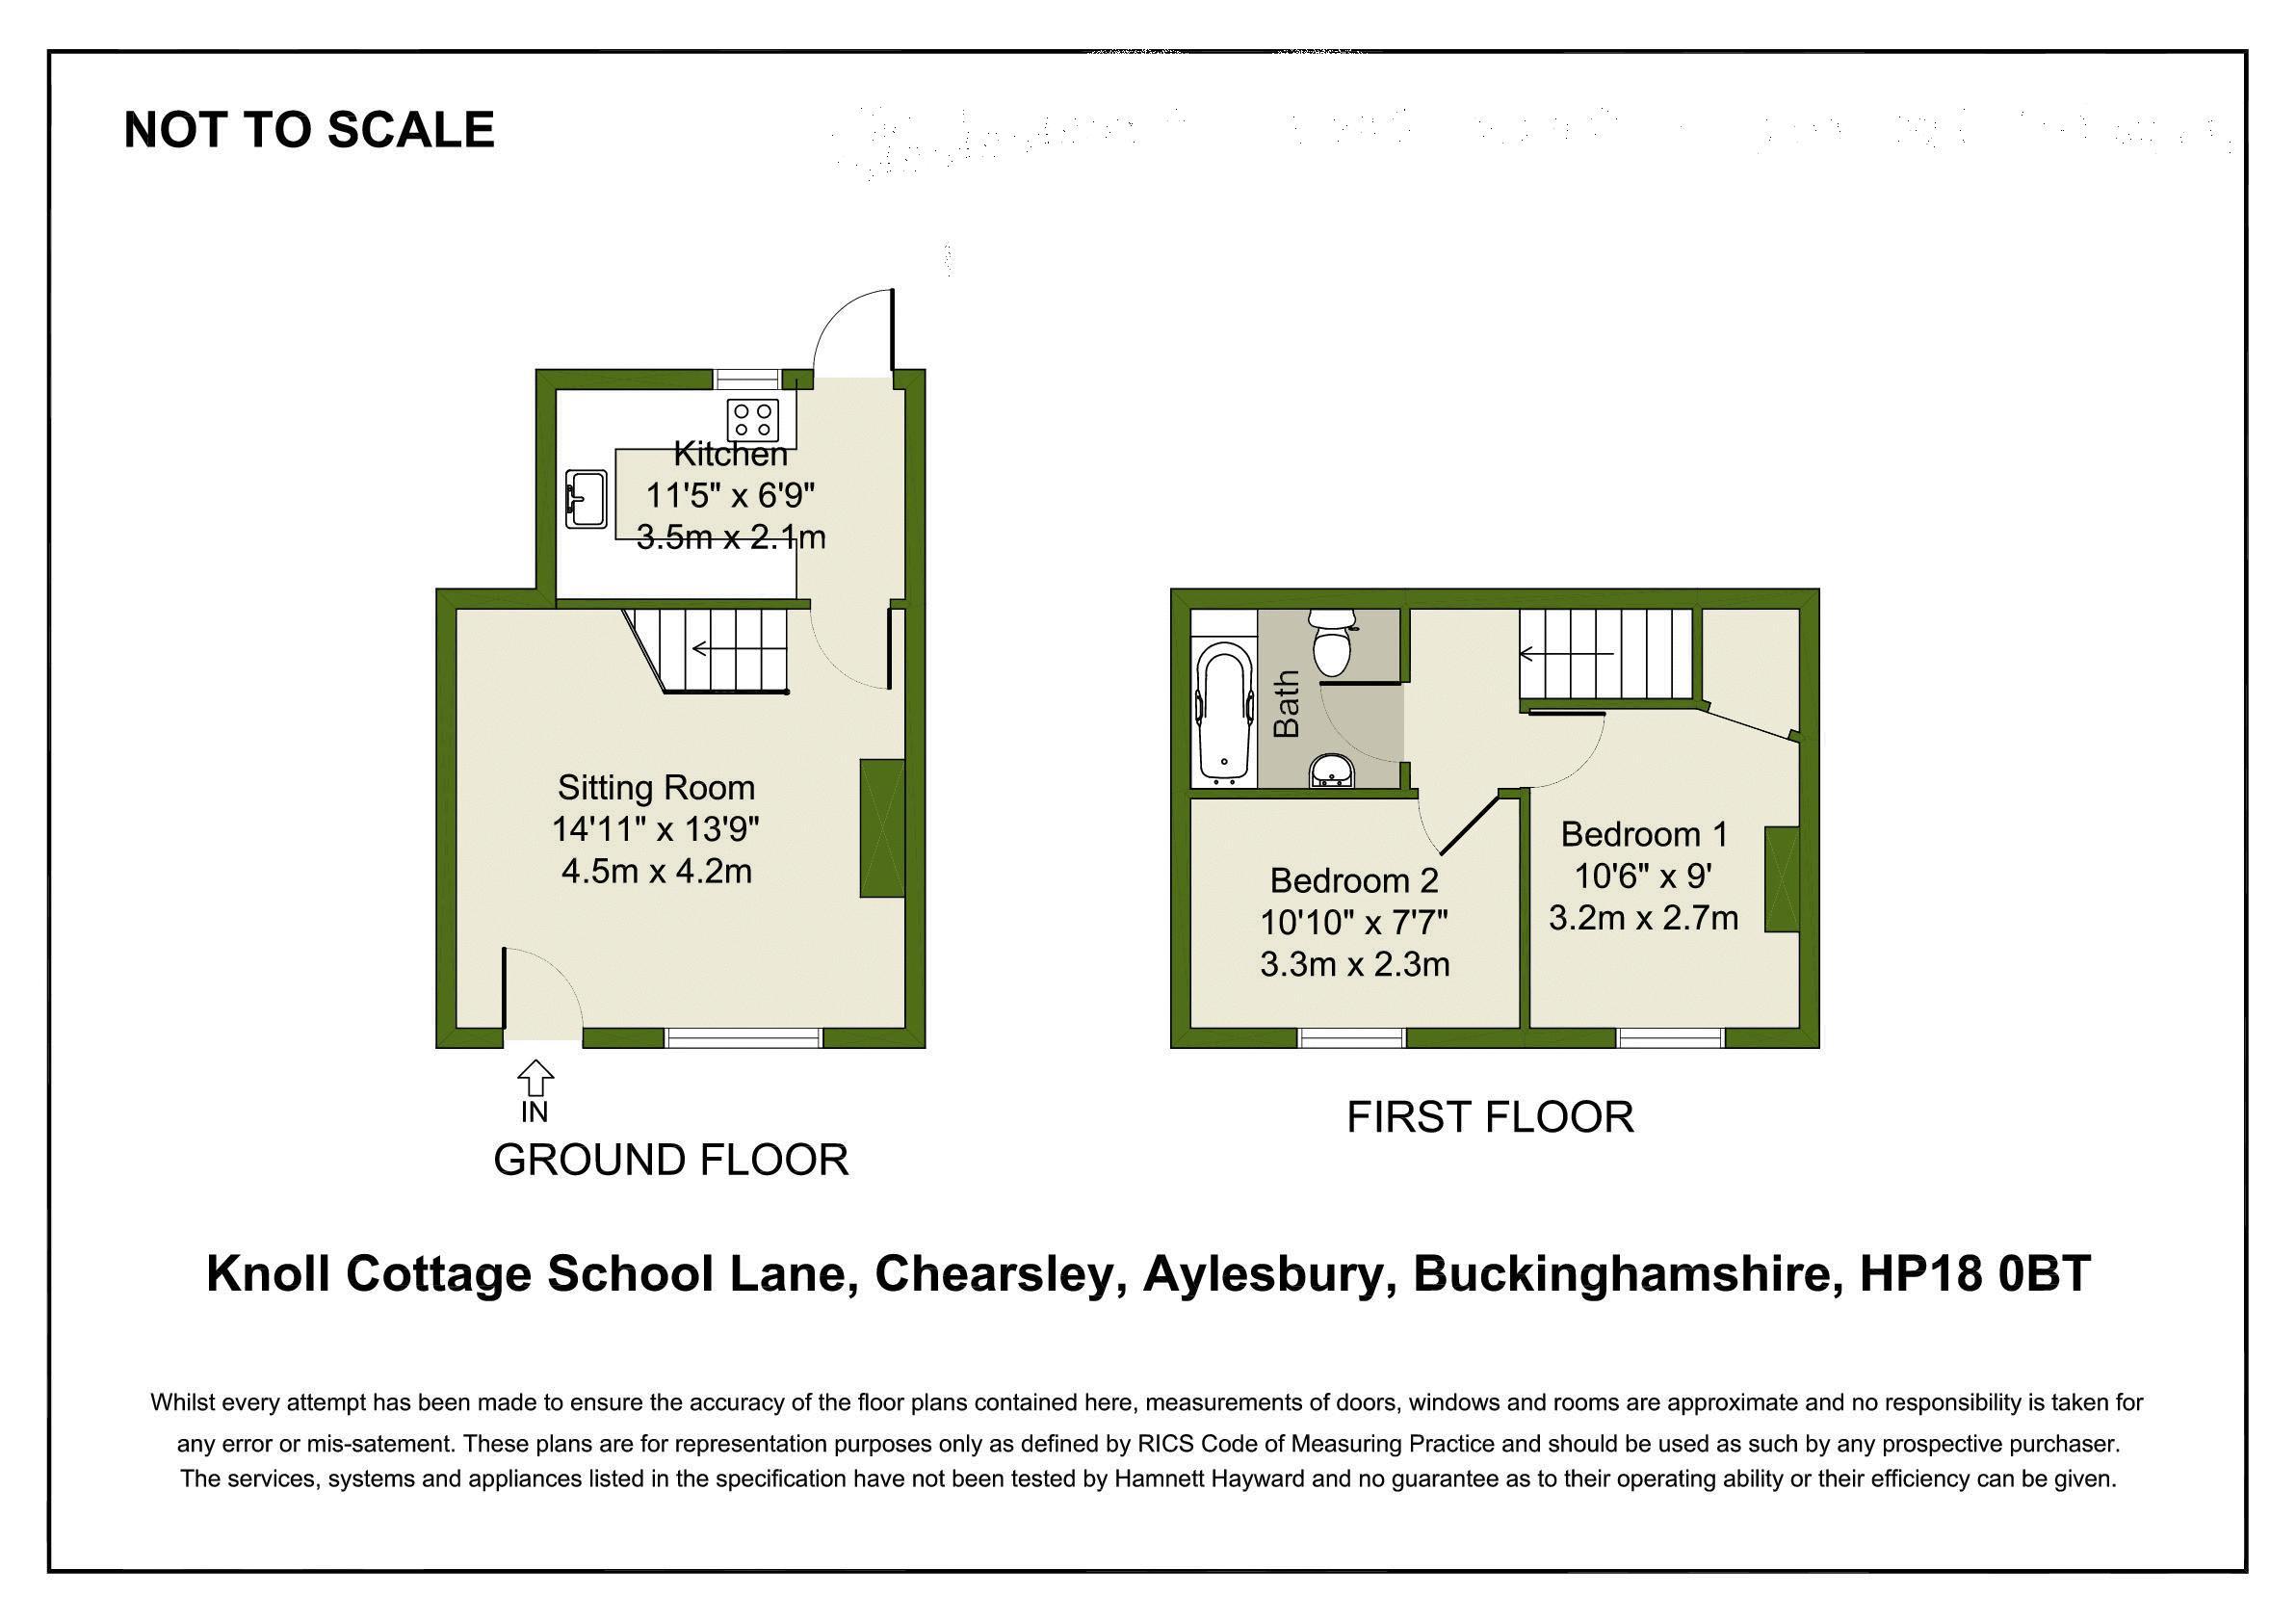 School Lane Chearsley